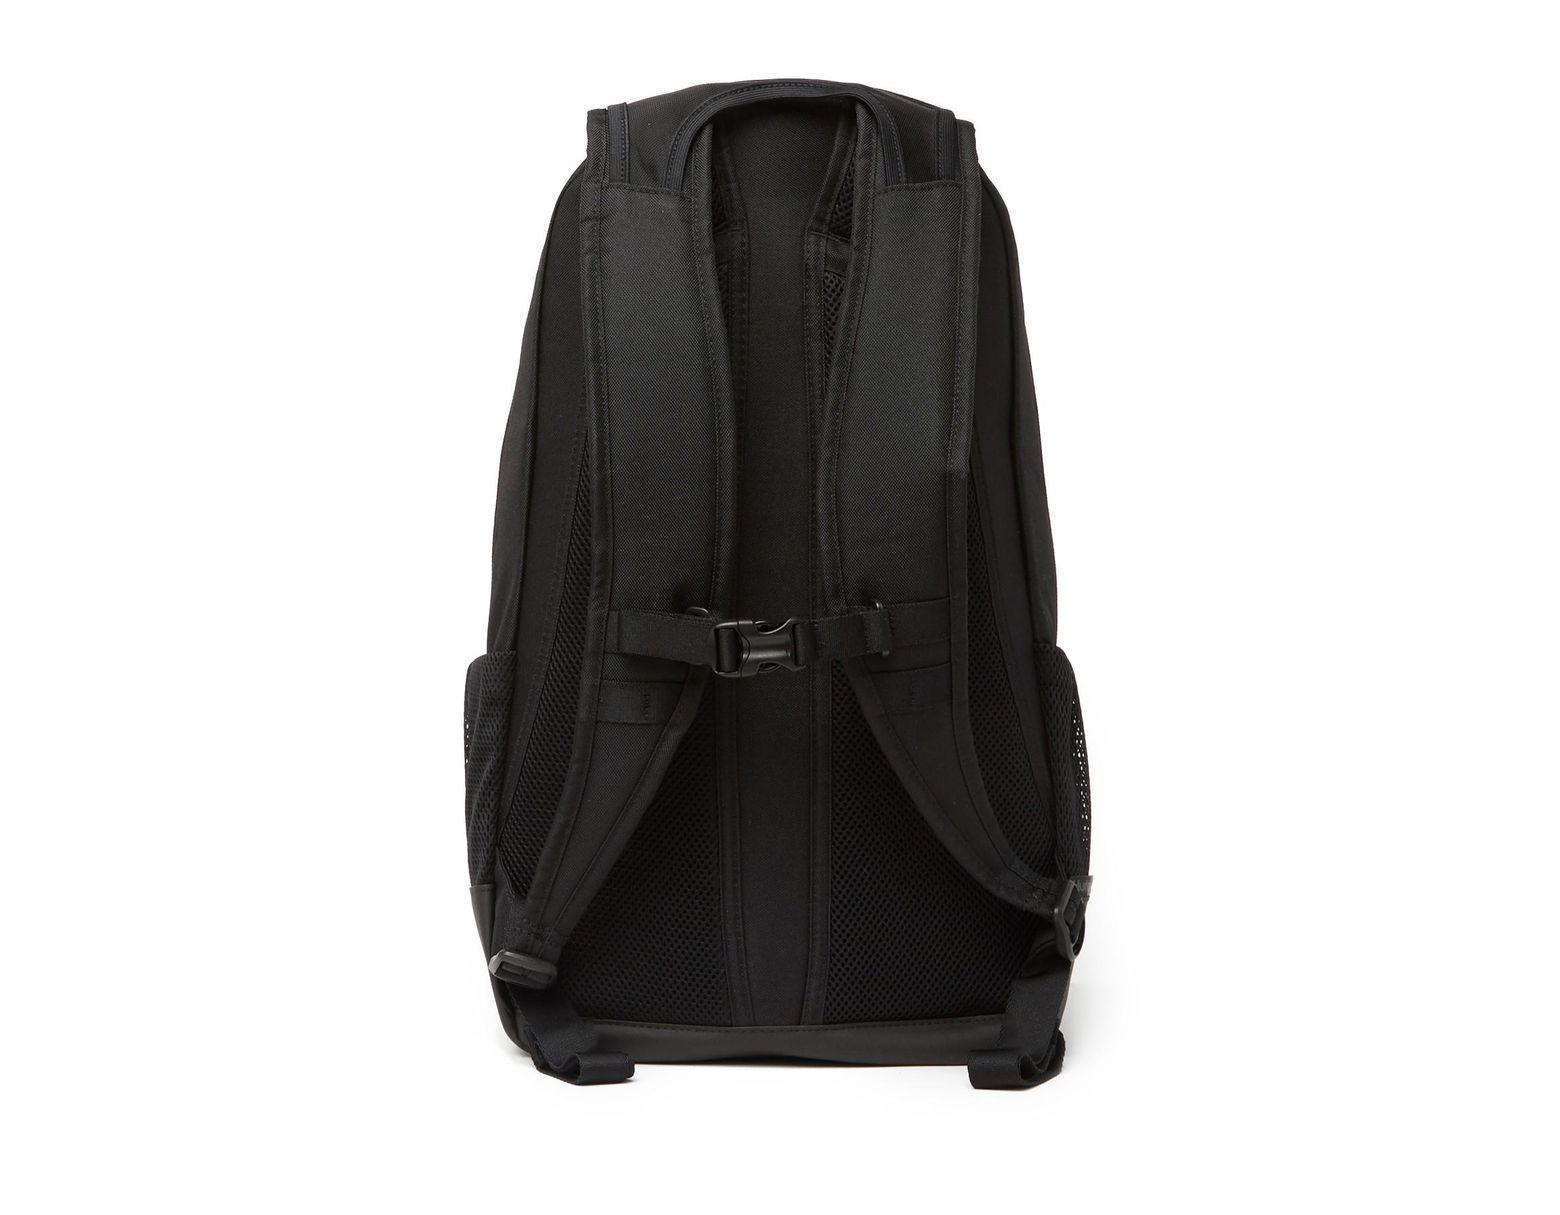 7ebf7885b78 Hurley Patrol Ii Backpack in Black for Men - Save 23% - Lyst